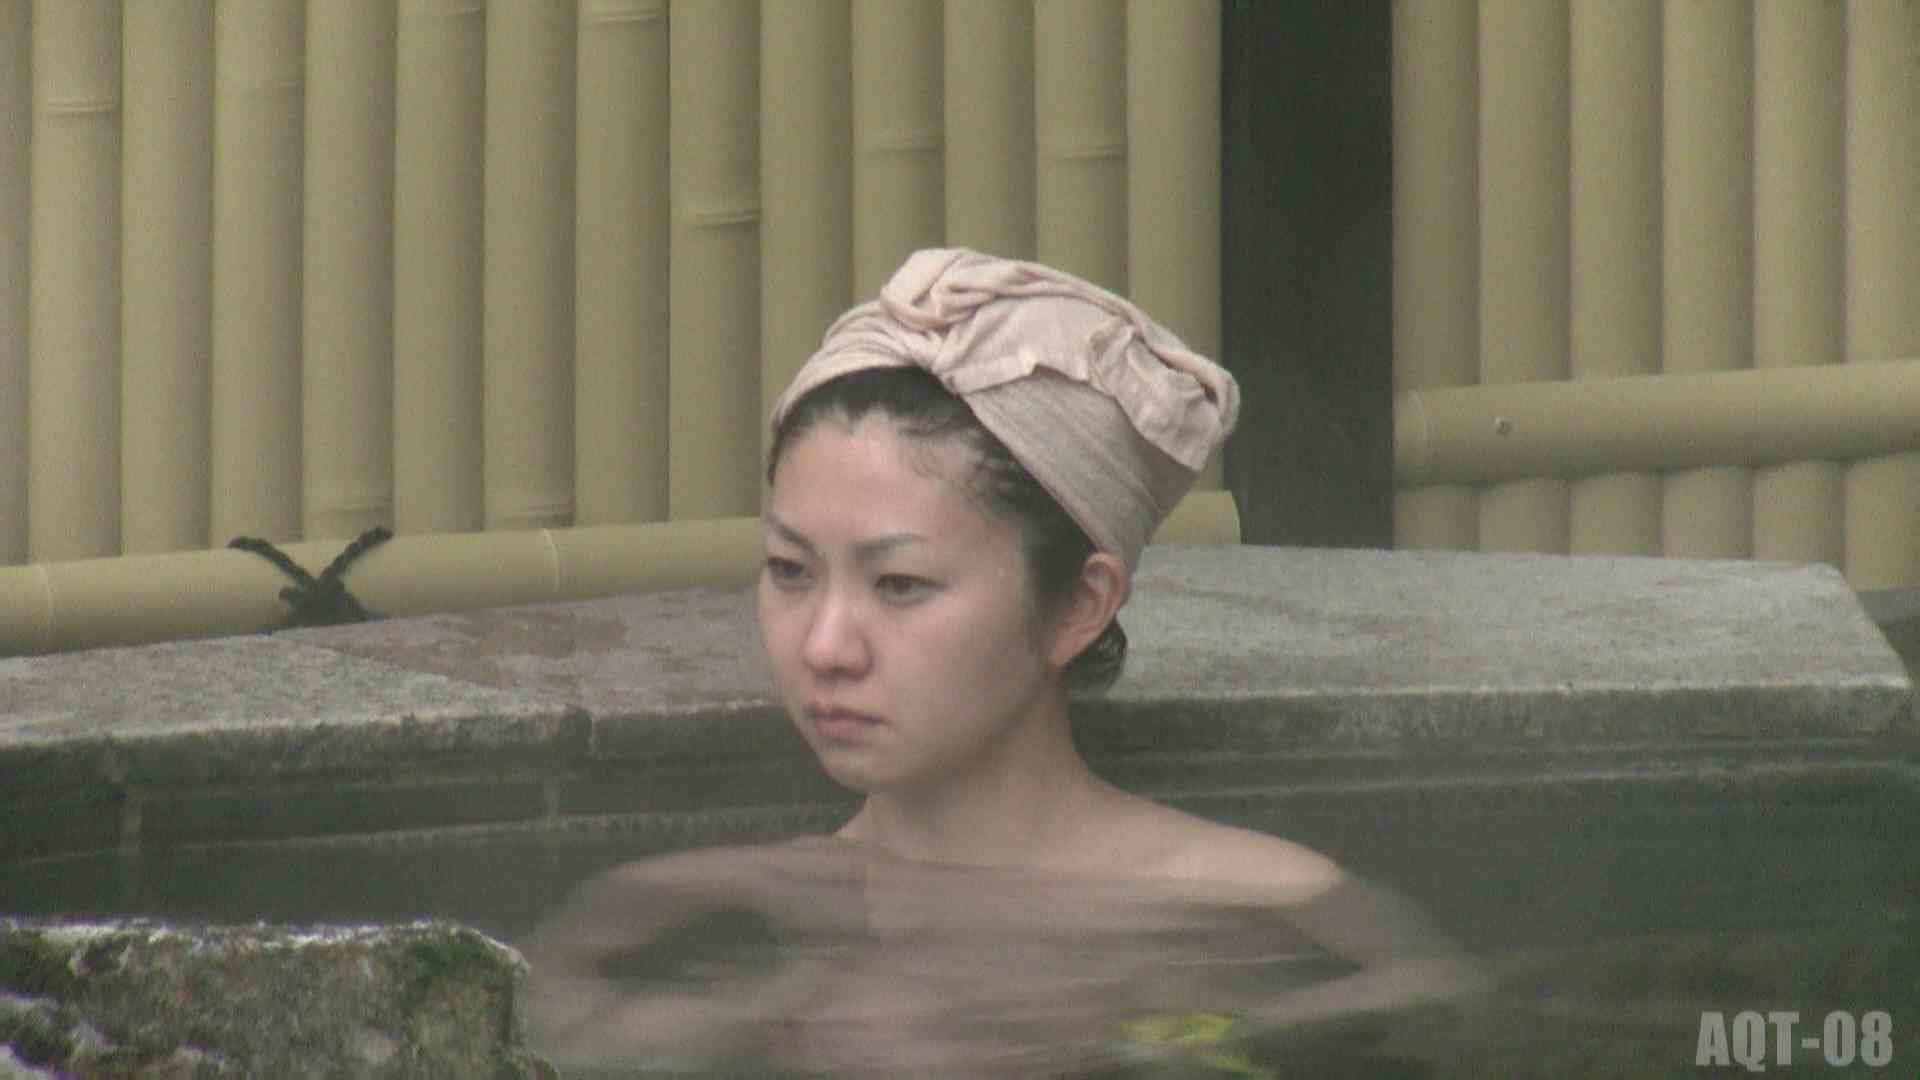 Aquaな露天風呂Vol.772 OL女体  39連発 15